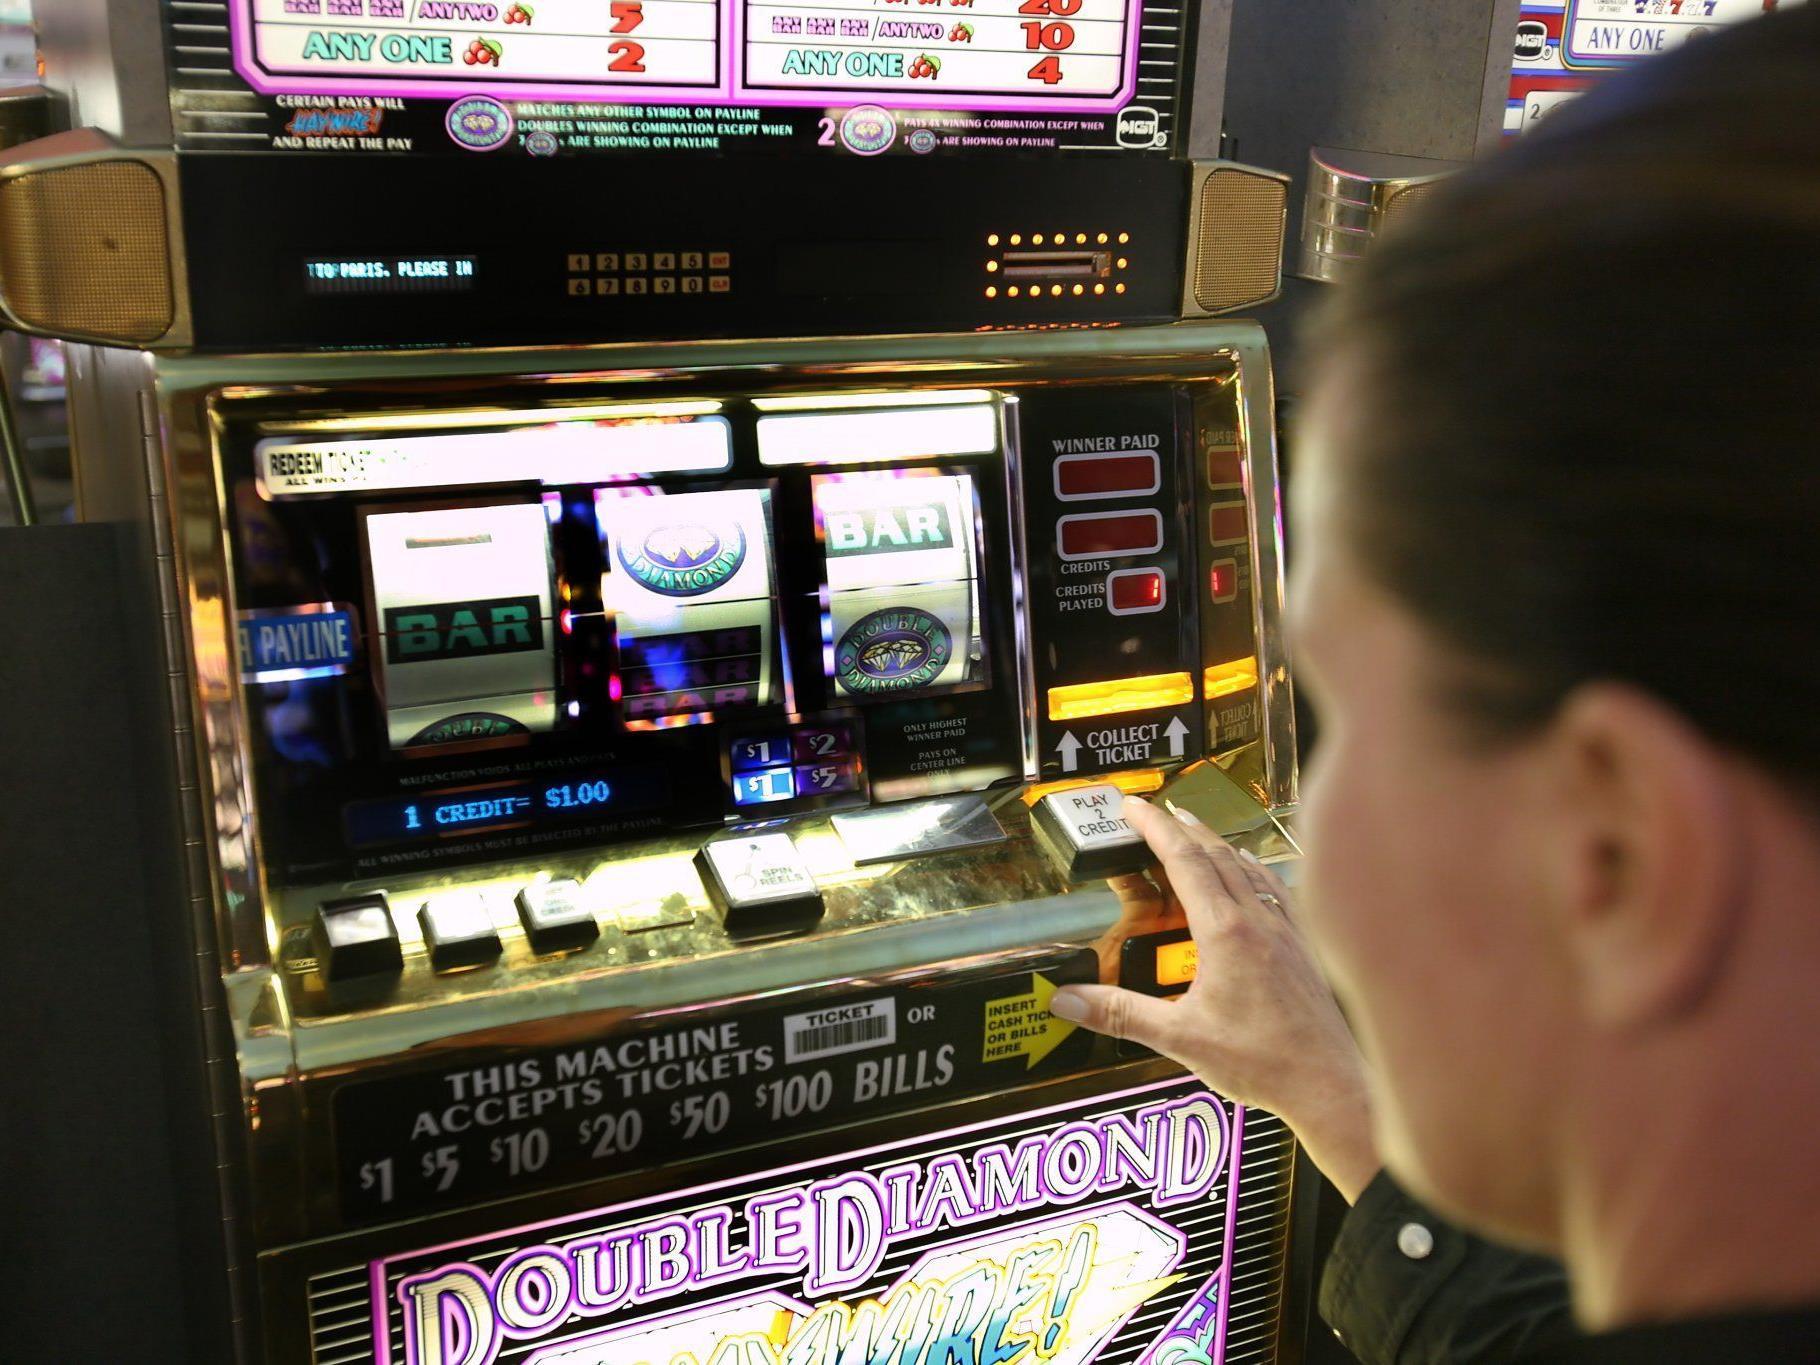 LR Schwärzler: Heuer bereits knapp 400 Glücksspielgeräte beschlagnahmt.